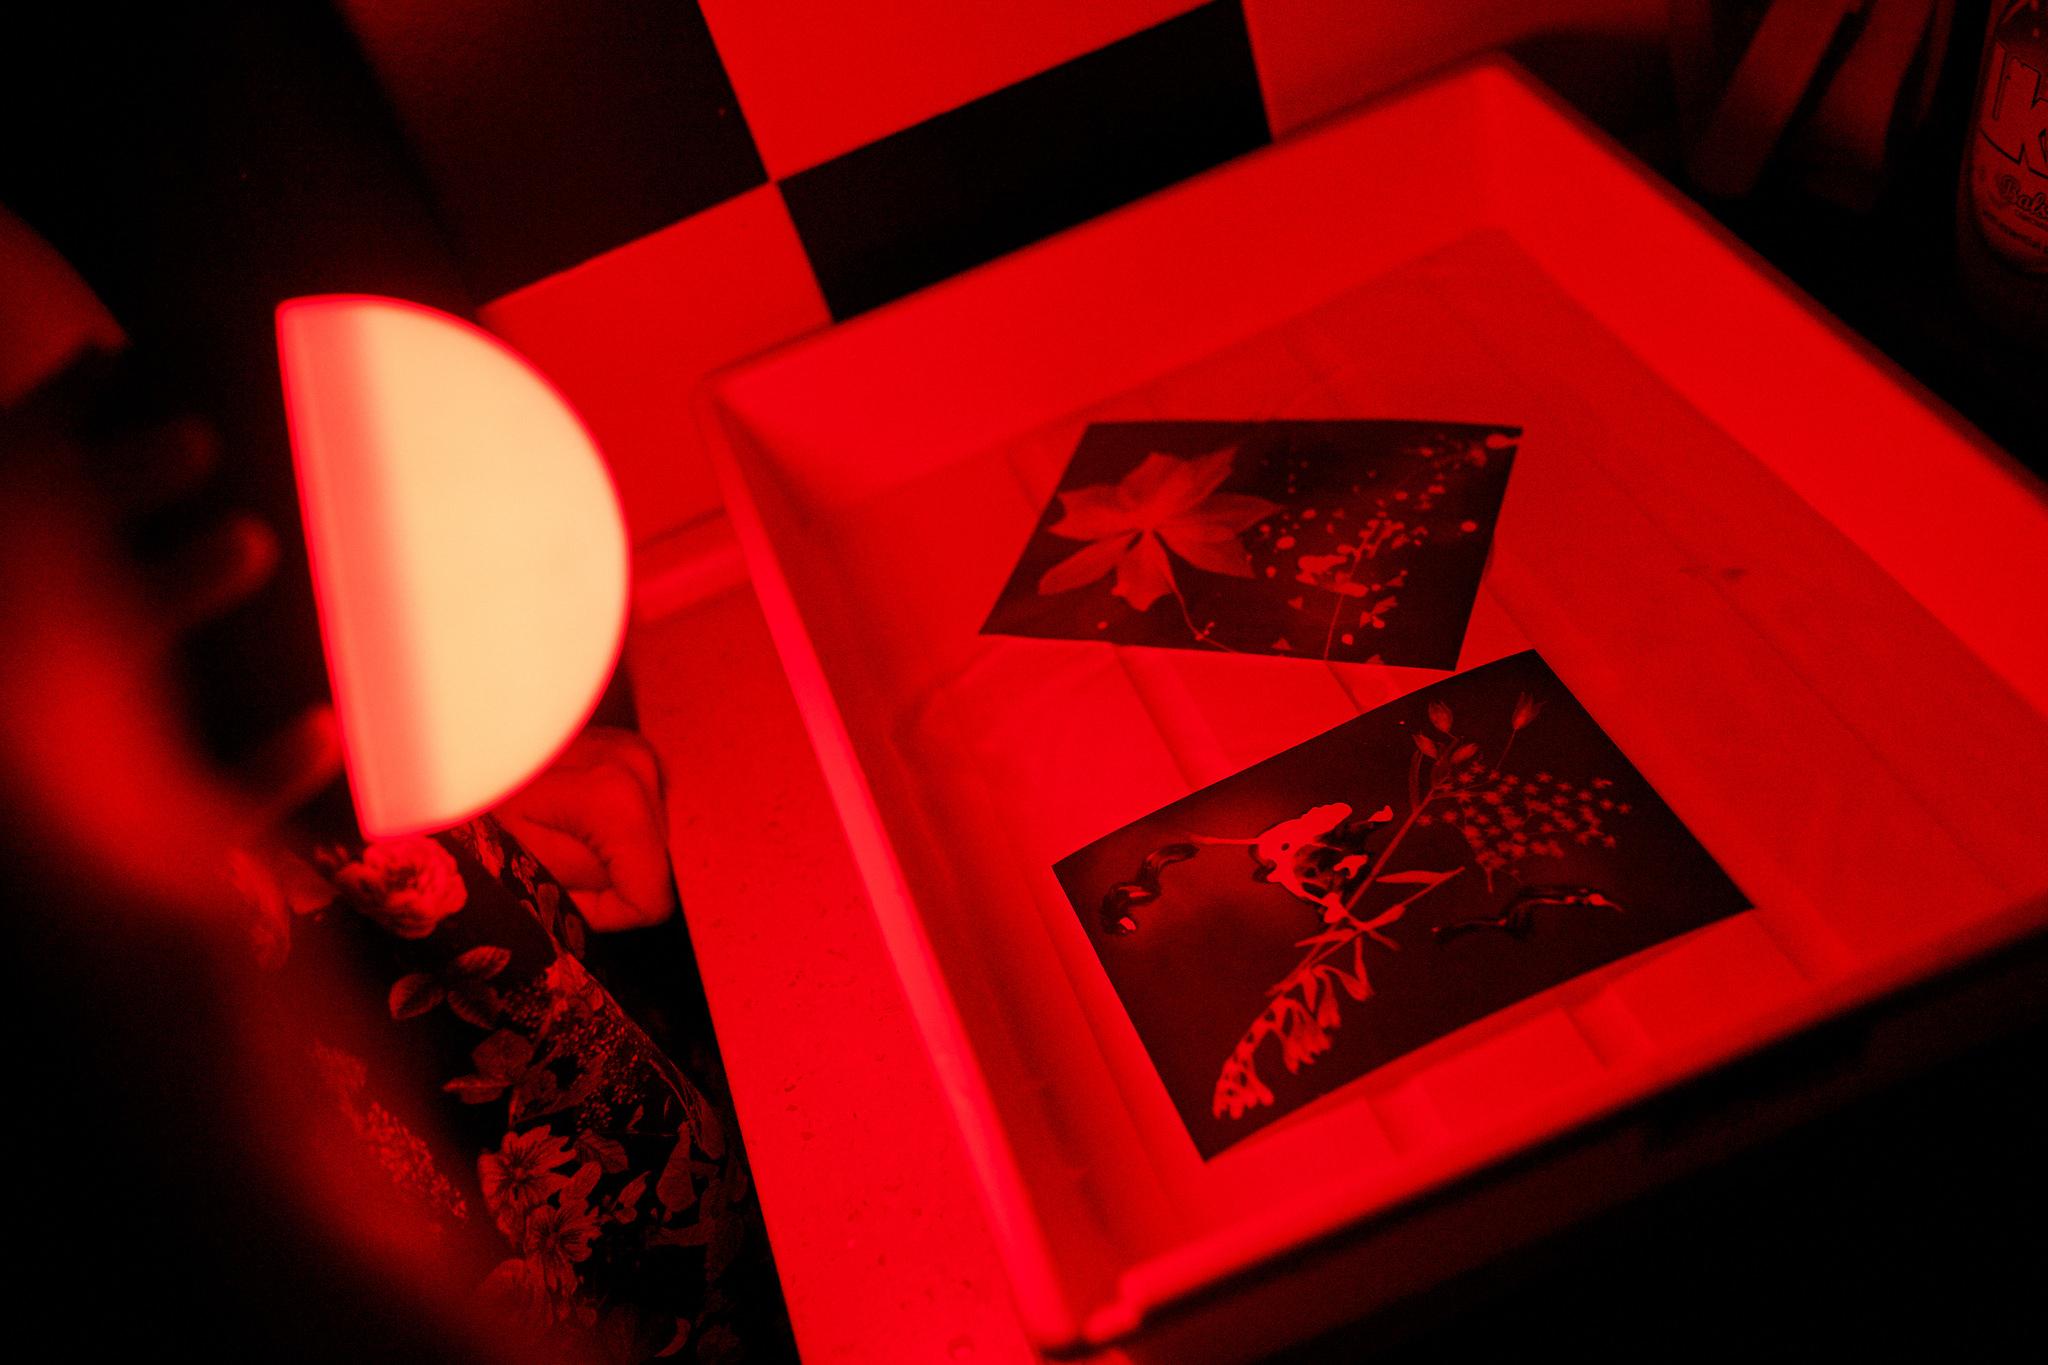 PHOTOGRAMS – A Workshop For Children Lead By Snježana Josipović